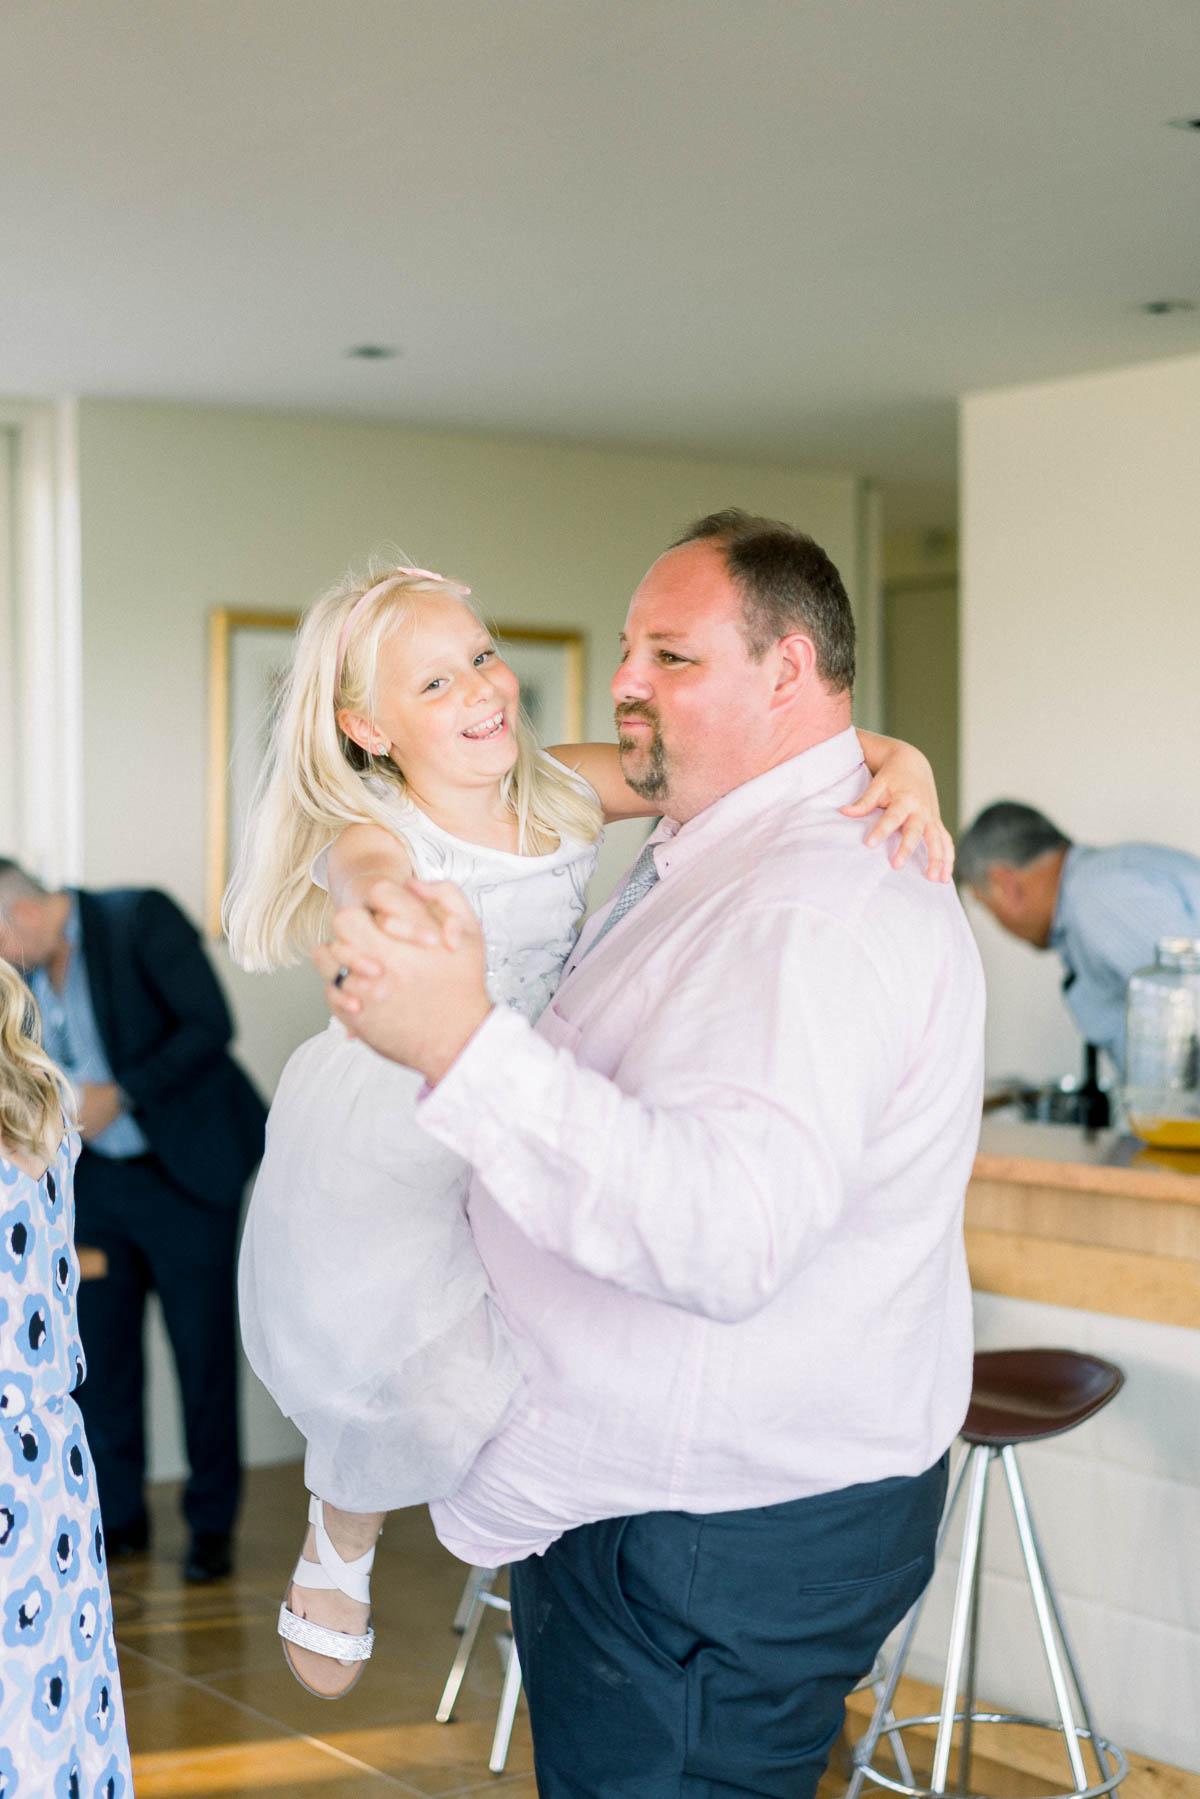 mt-eliza-mornington-peninsula-backyard-wedding-heart+soul-weddings-allison-matt-03928.jpg